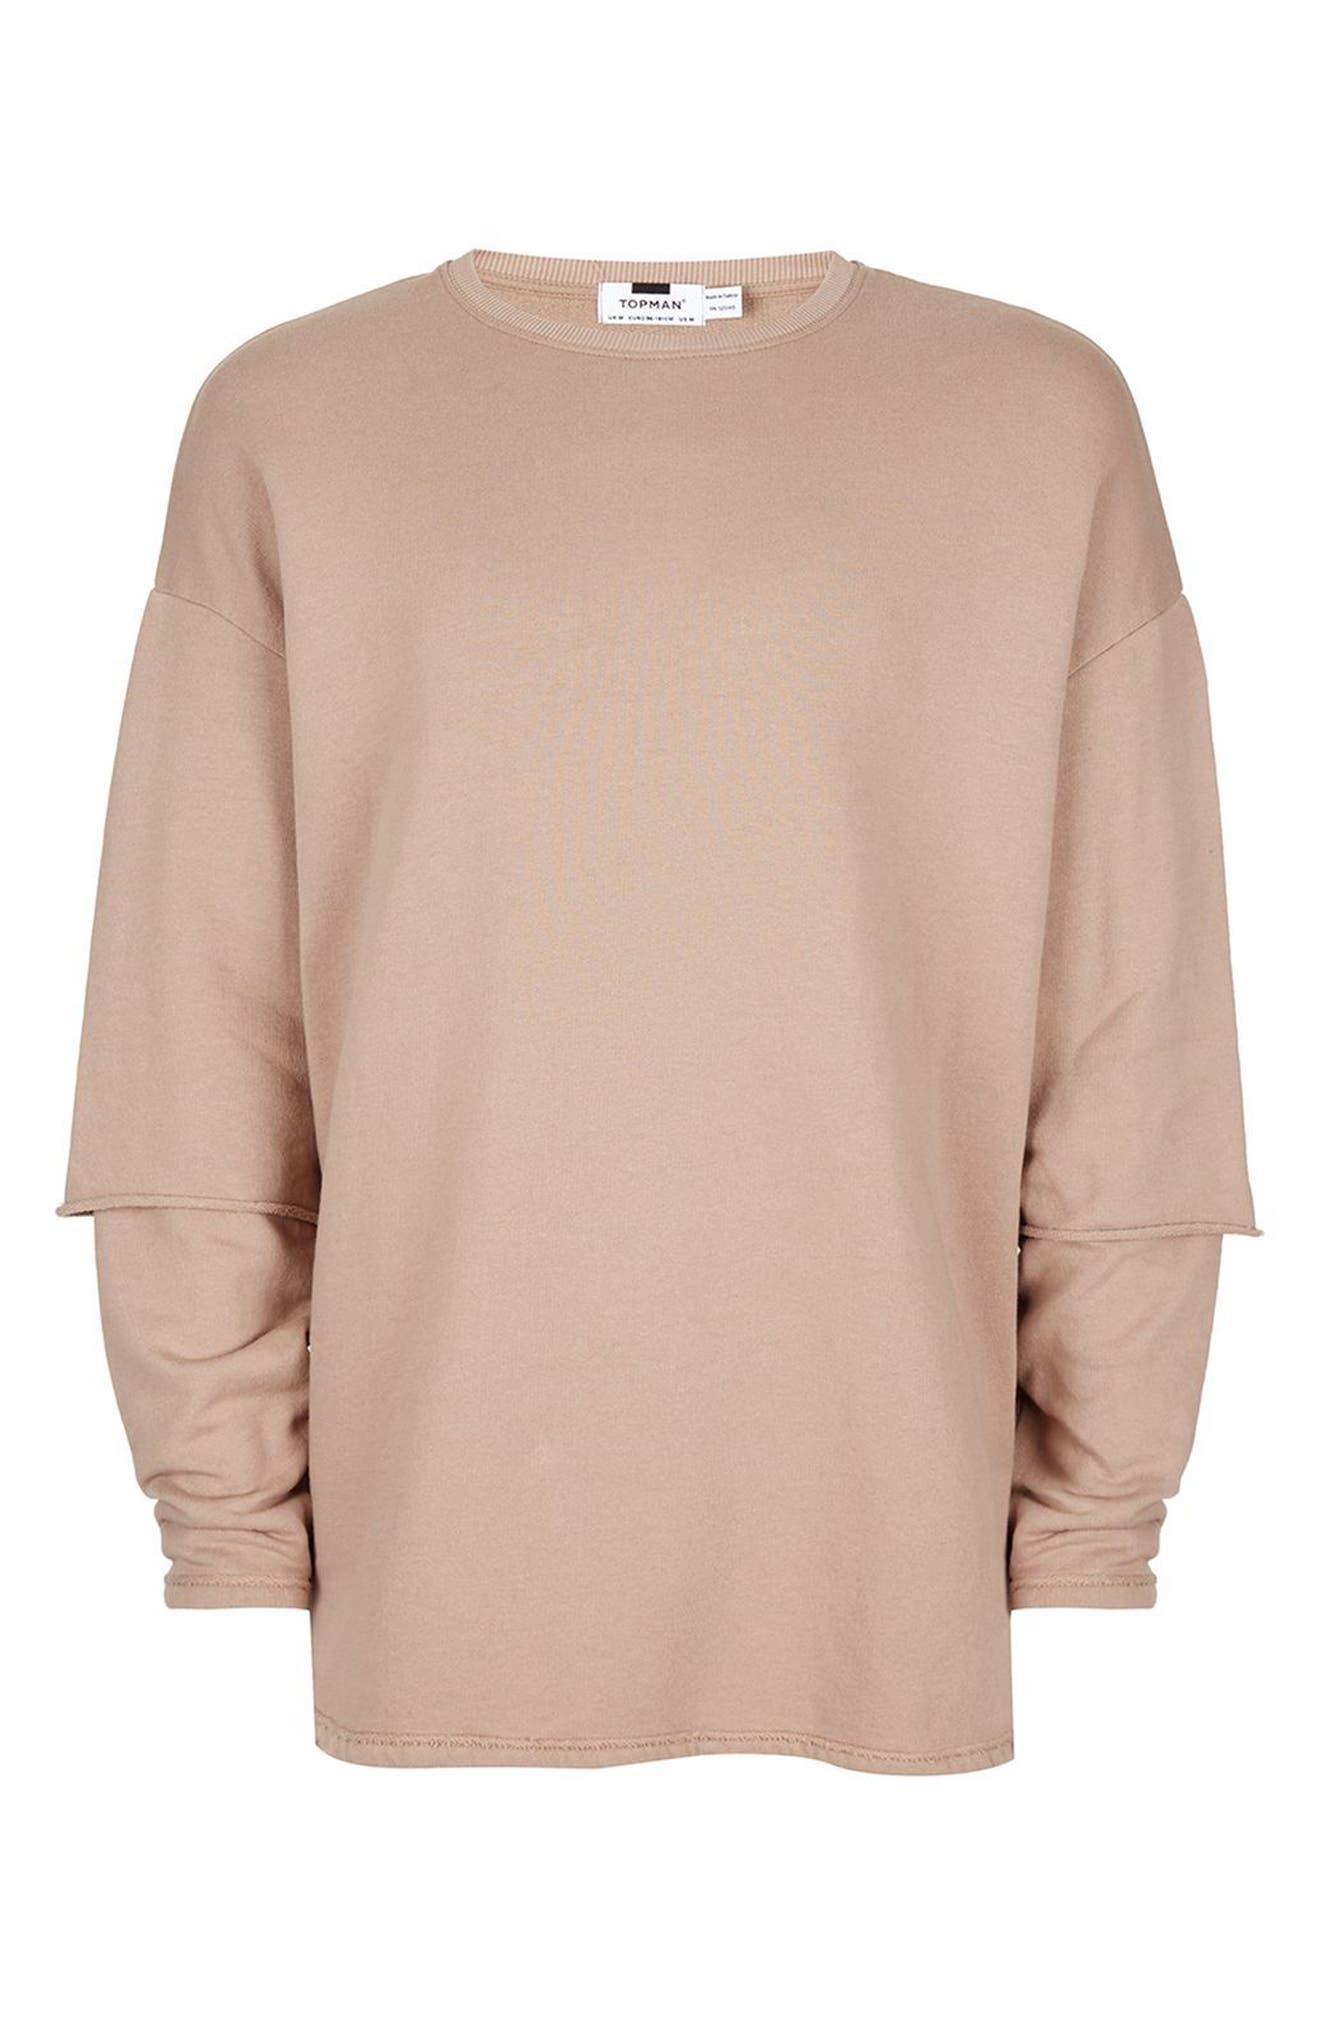 Layer Sleeve Sweatshirt,                             Alternate thumbnail 4, color,                             230